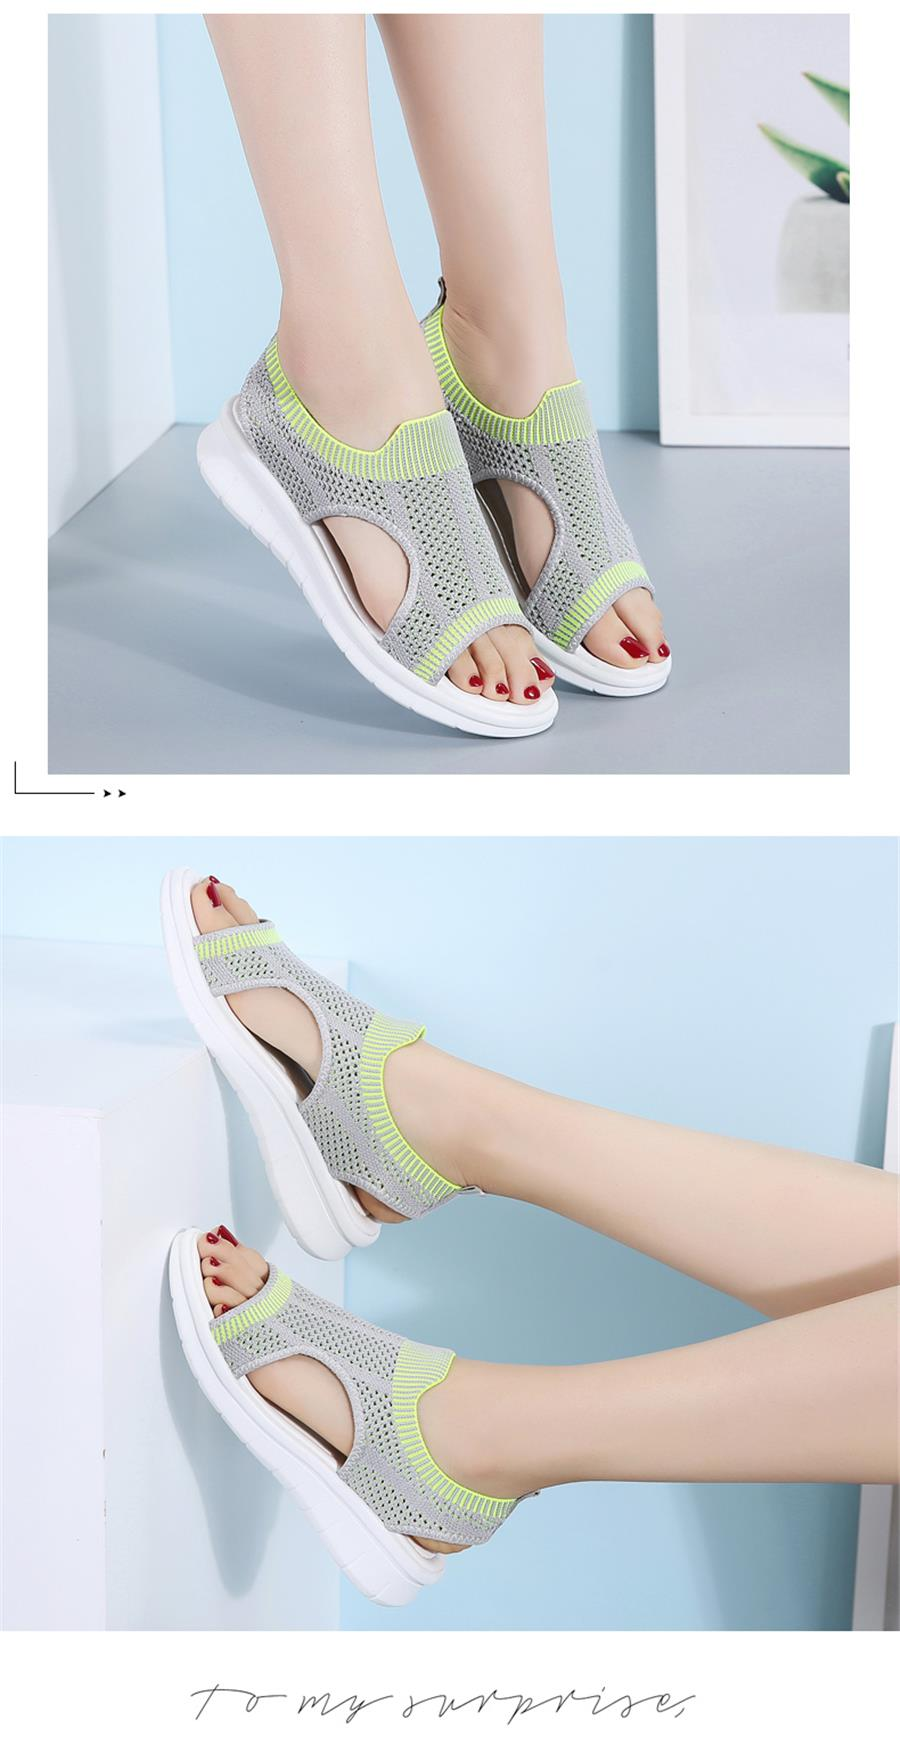 HTB1uBFjRXzqK1RjSZFvq6AB7VXay STQ Women sandals 2019 female shoes women summer wedge comfort sandals ladies flat slingback flat sandals women sandalias 7739